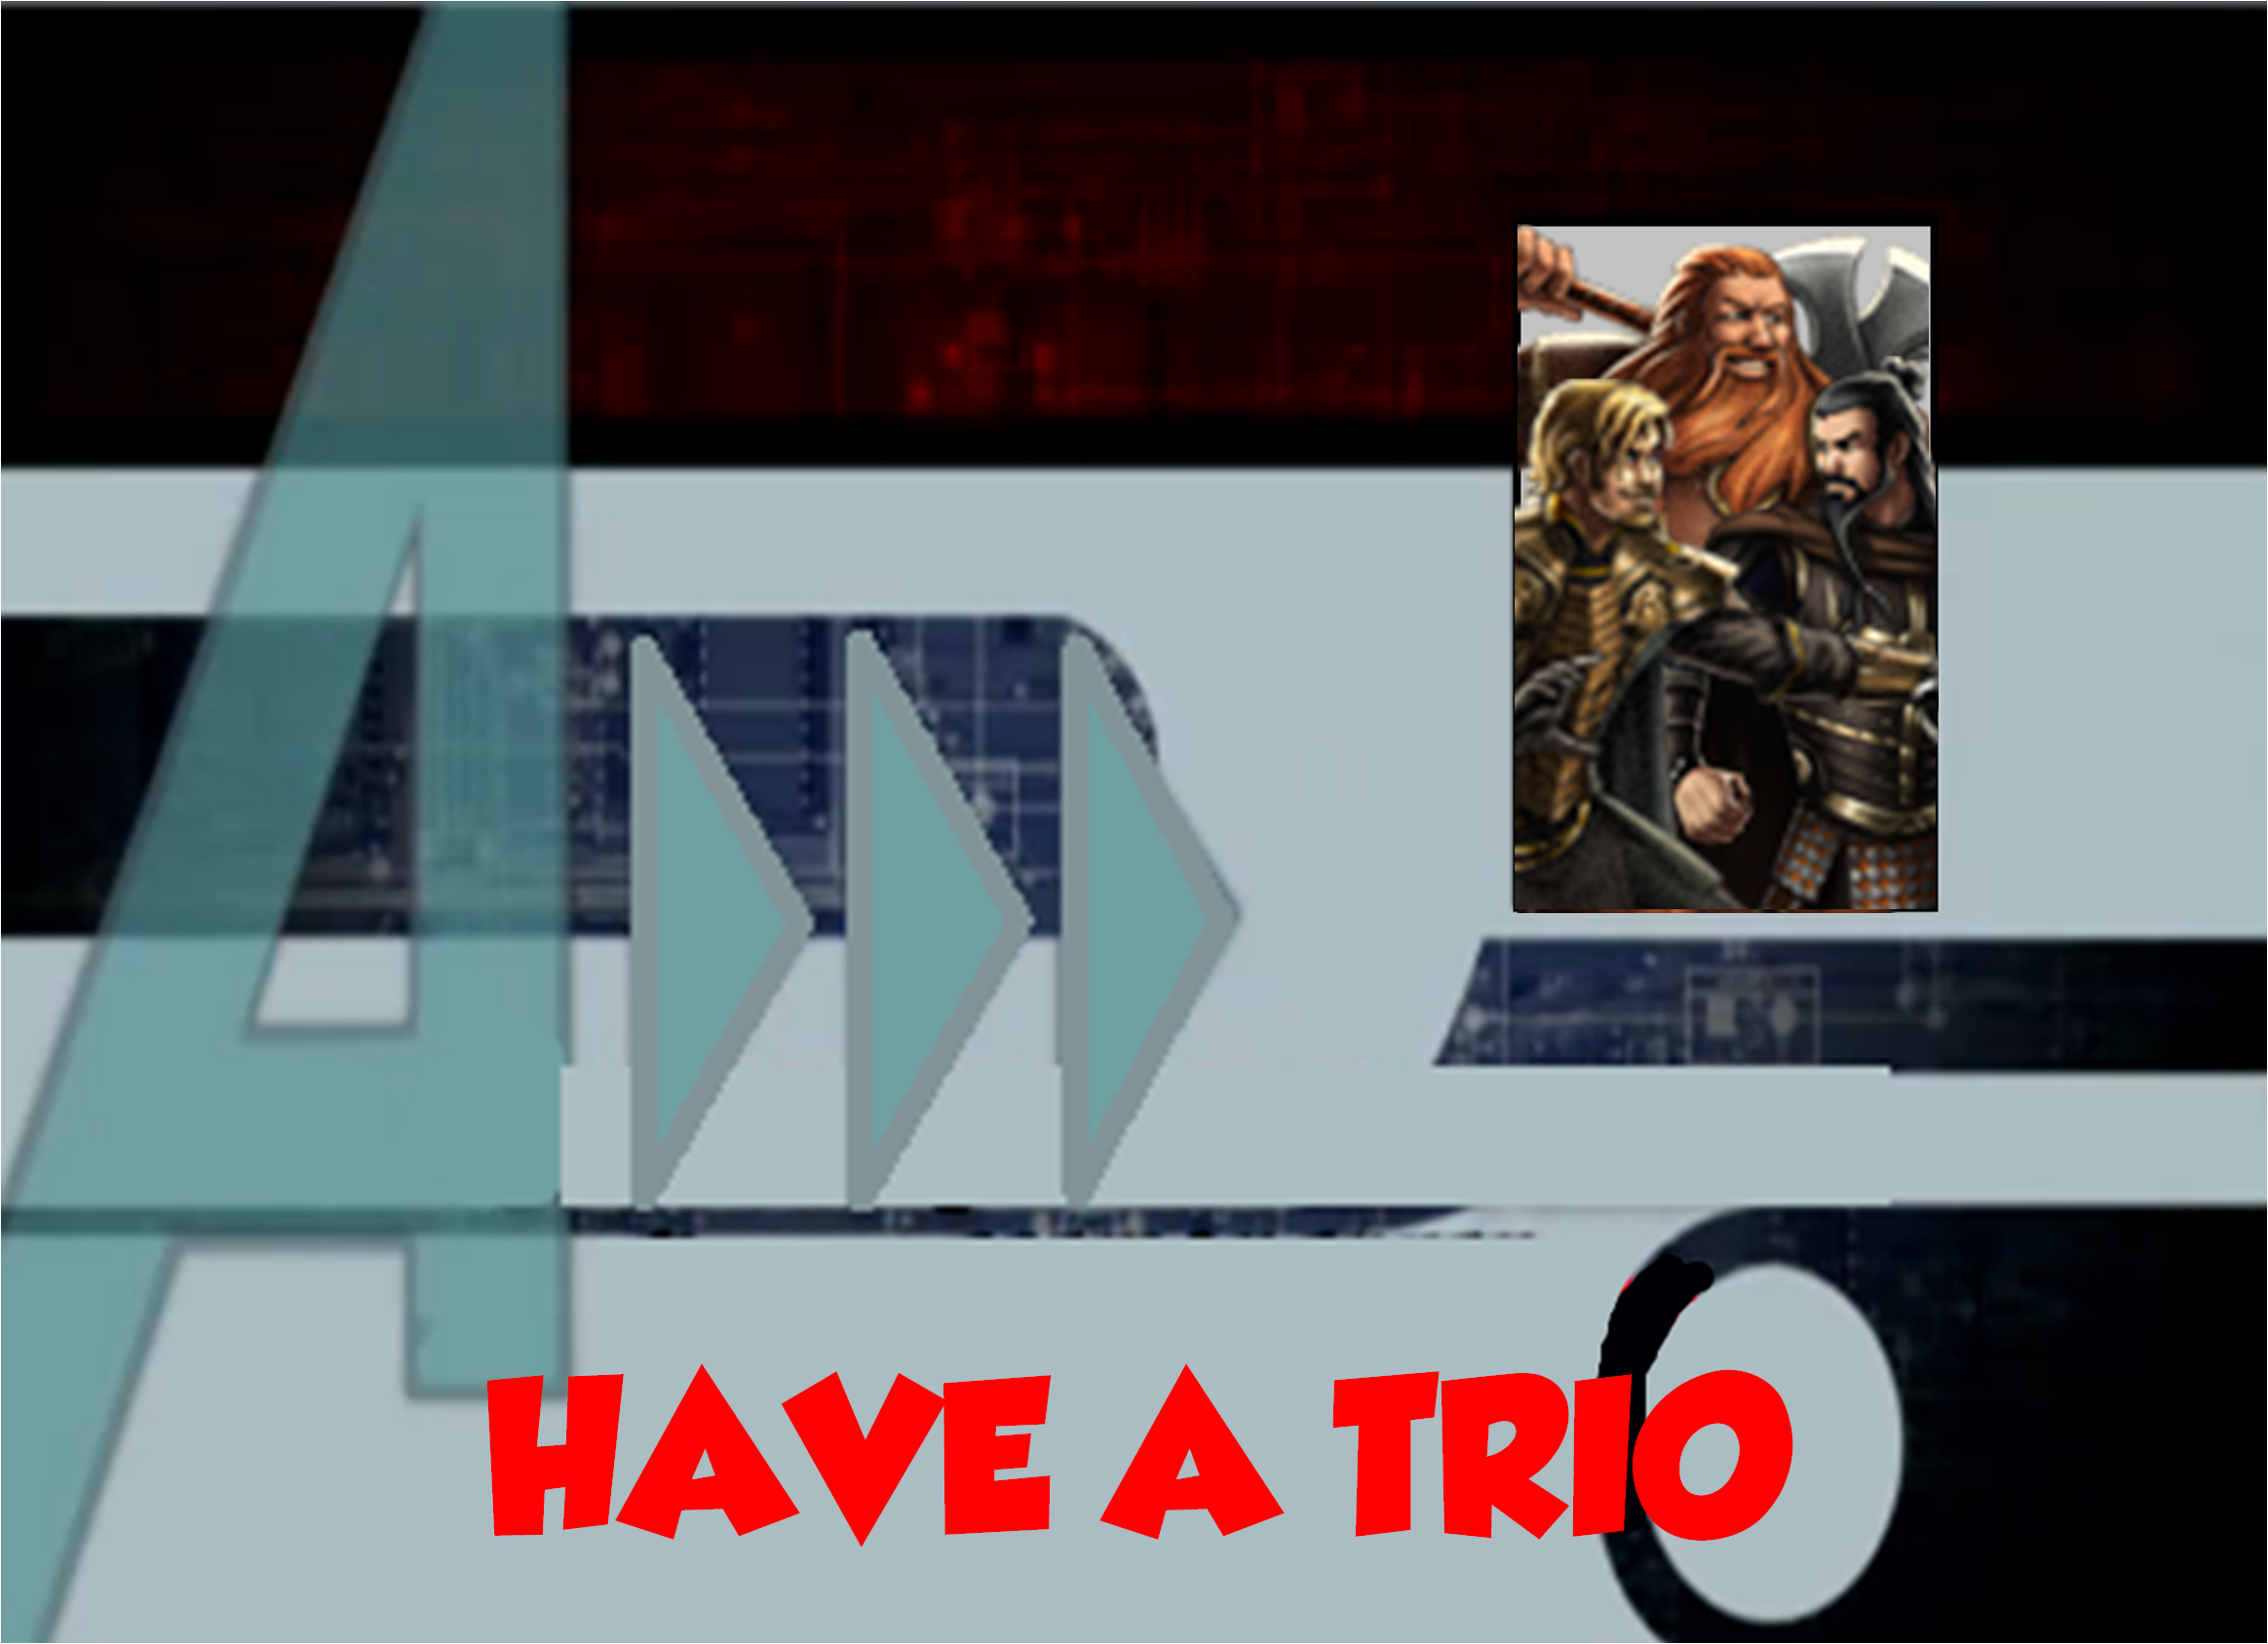 Have a Trio (A!)